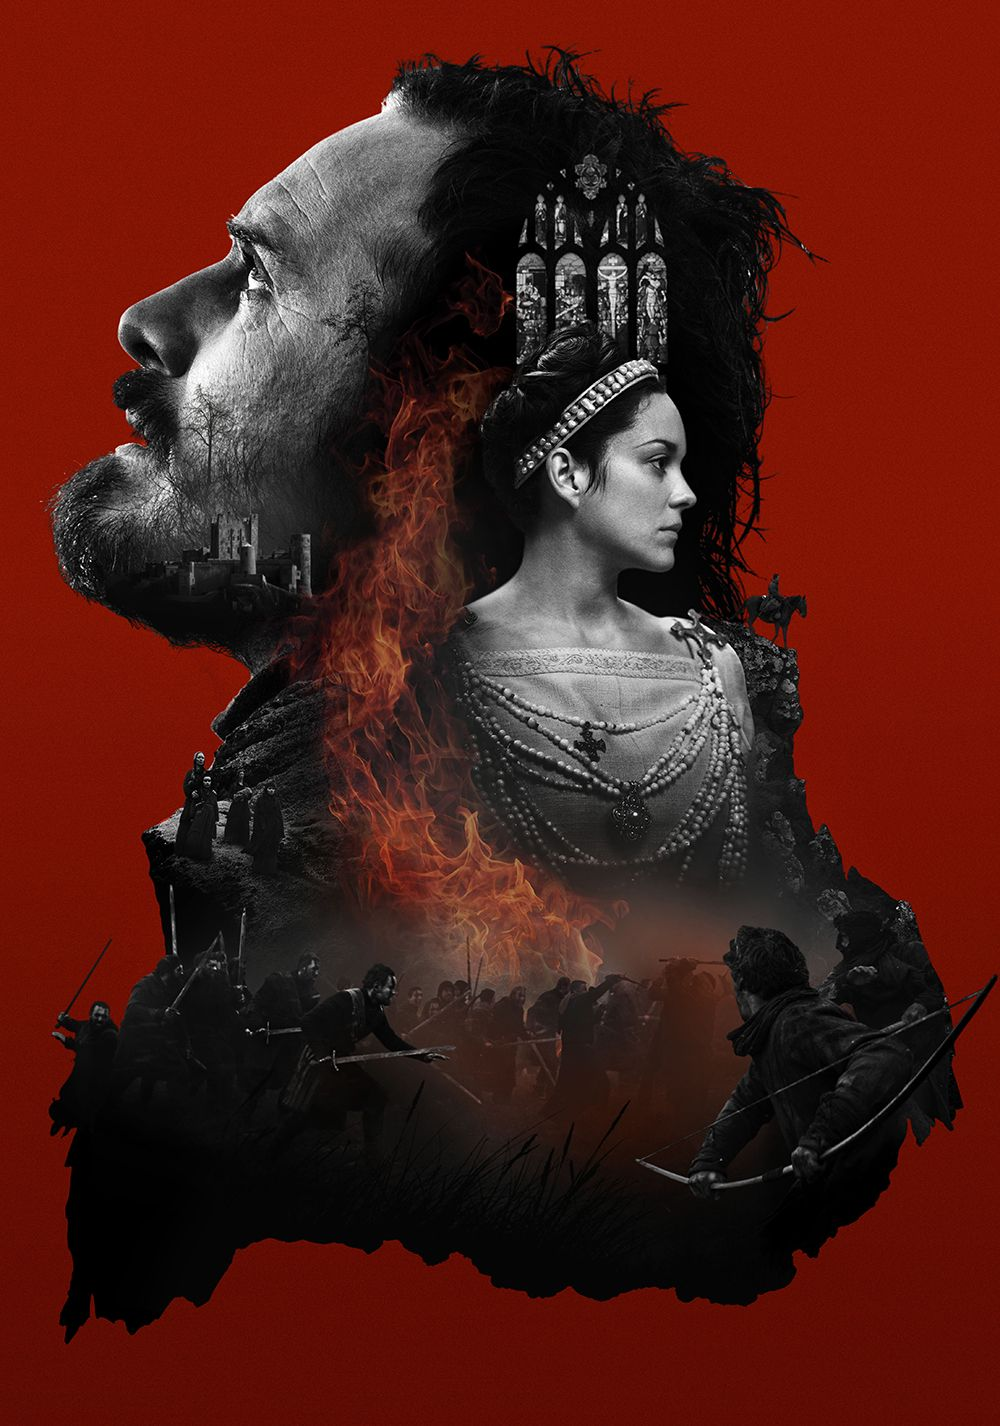 macbeth shakespeare full movie